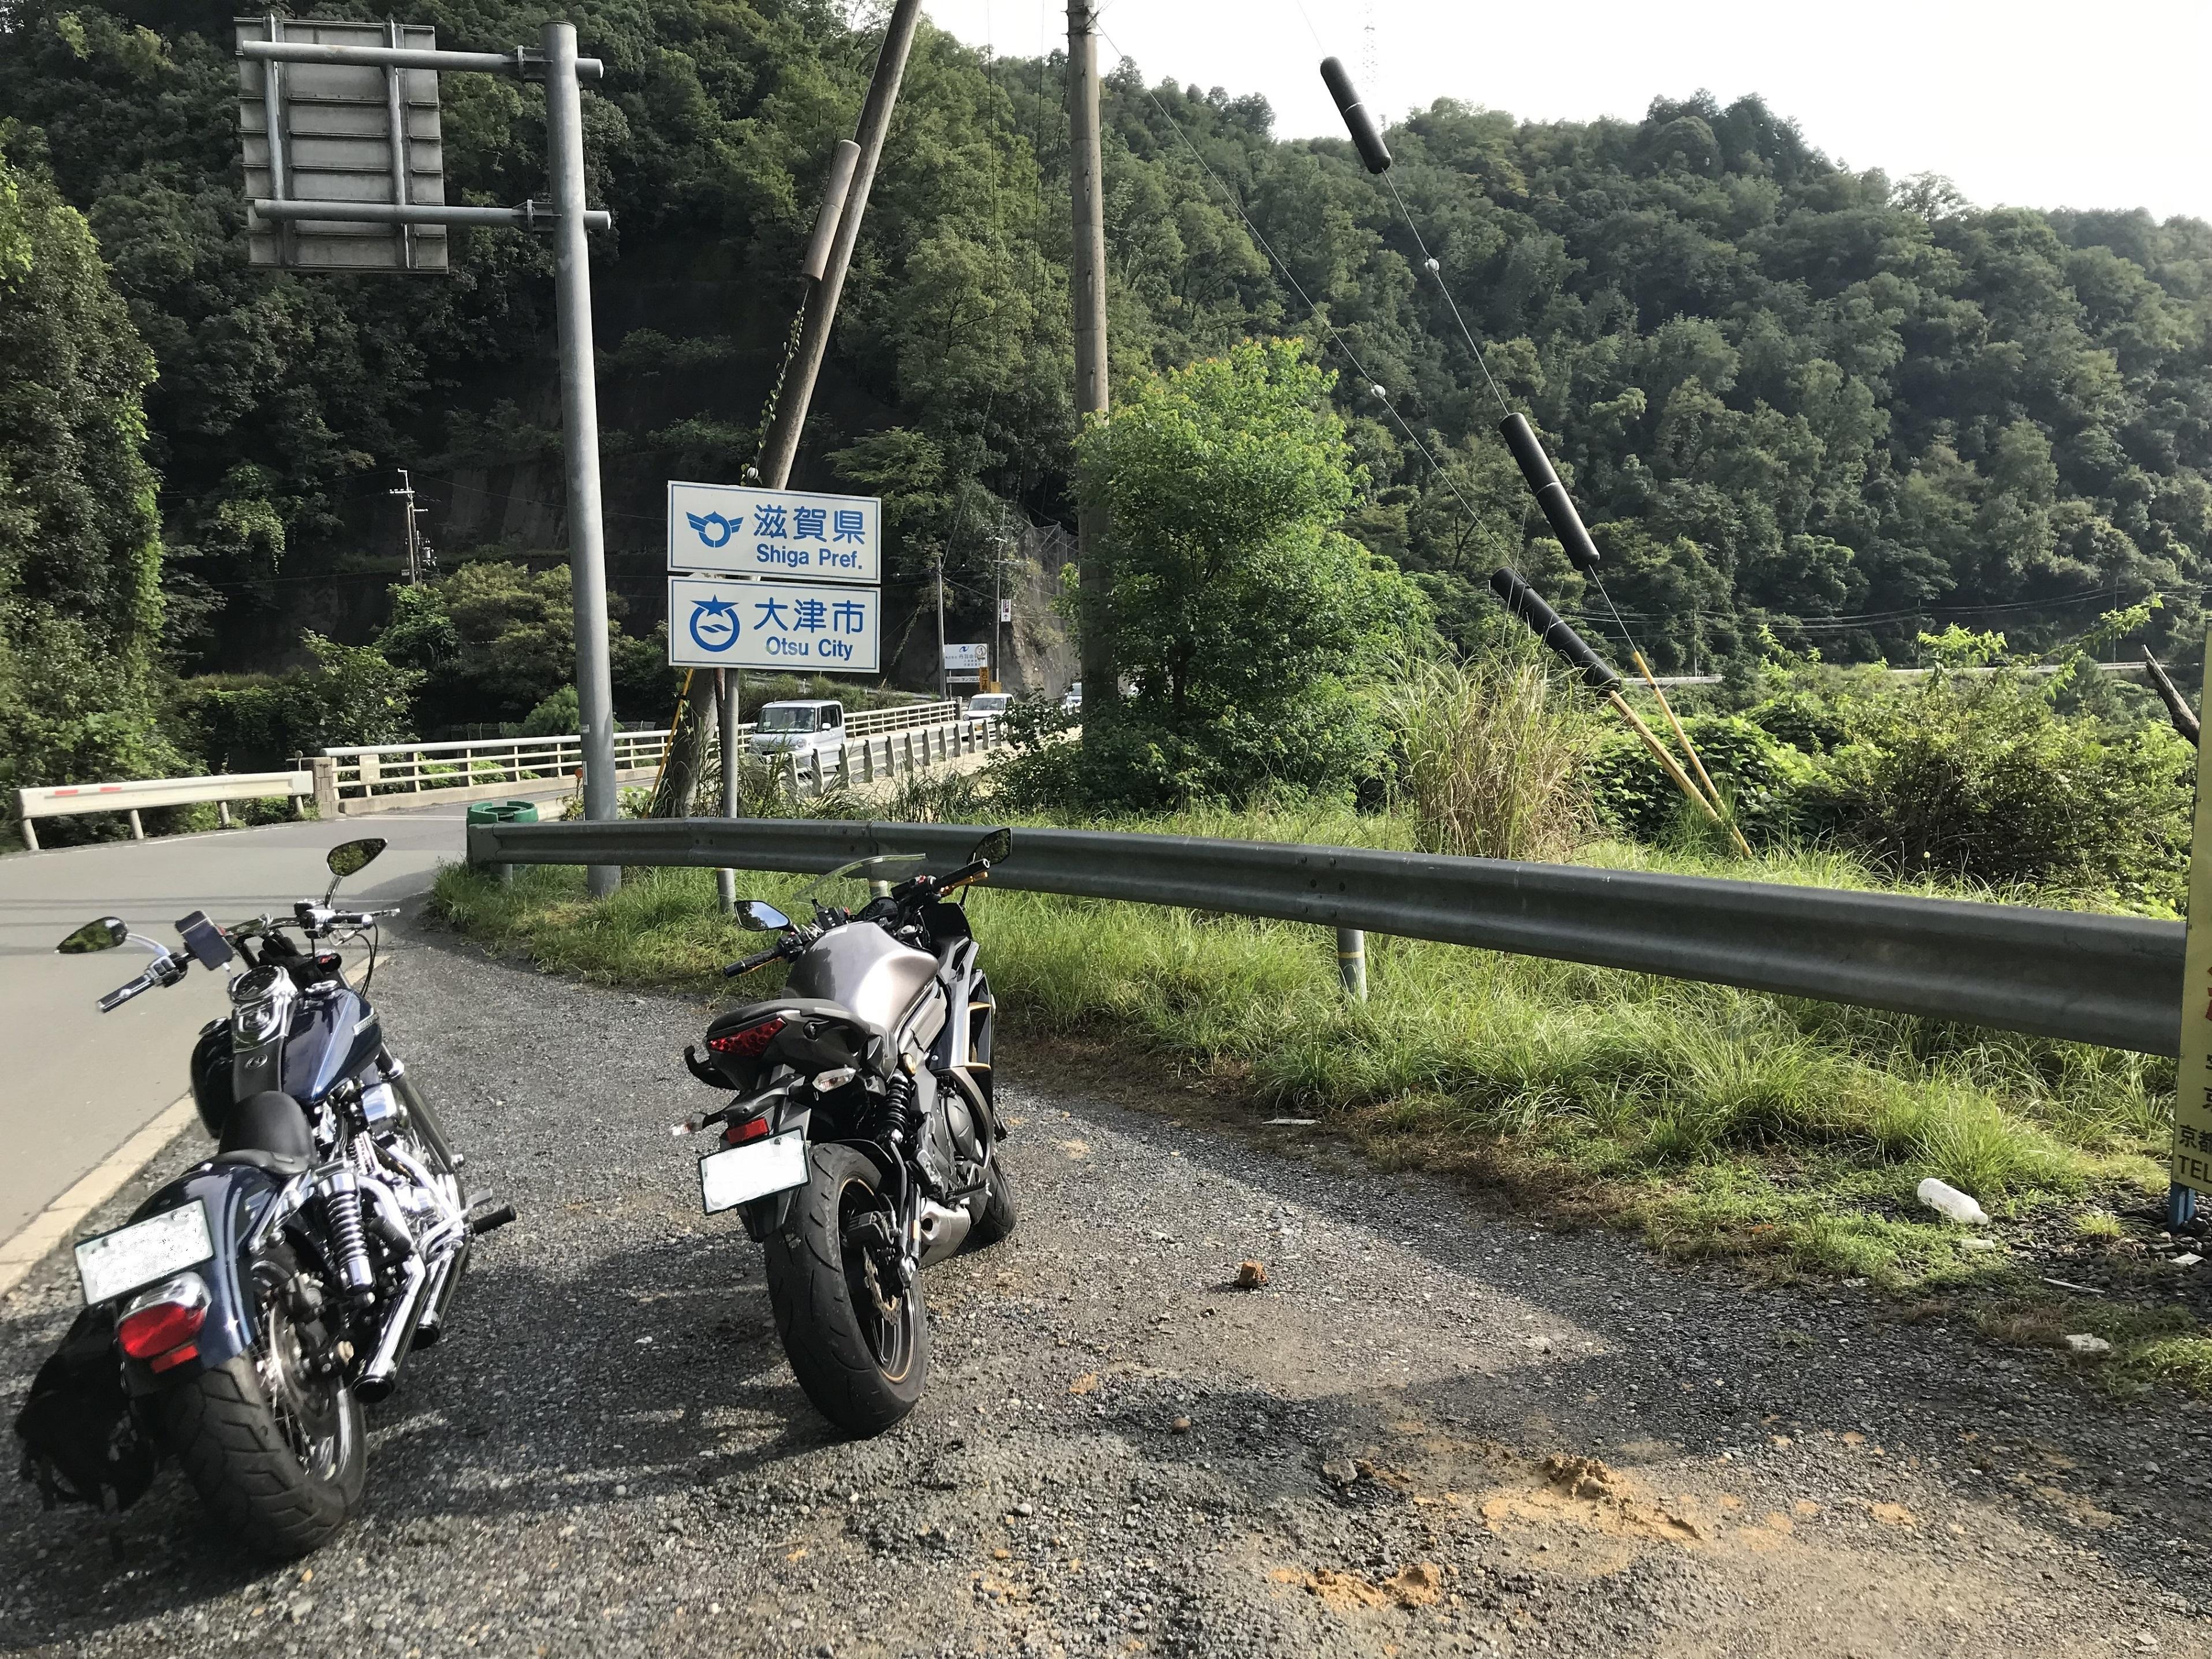 motorcycle-touring-oumihatiman-departure-siga-pref.jpg